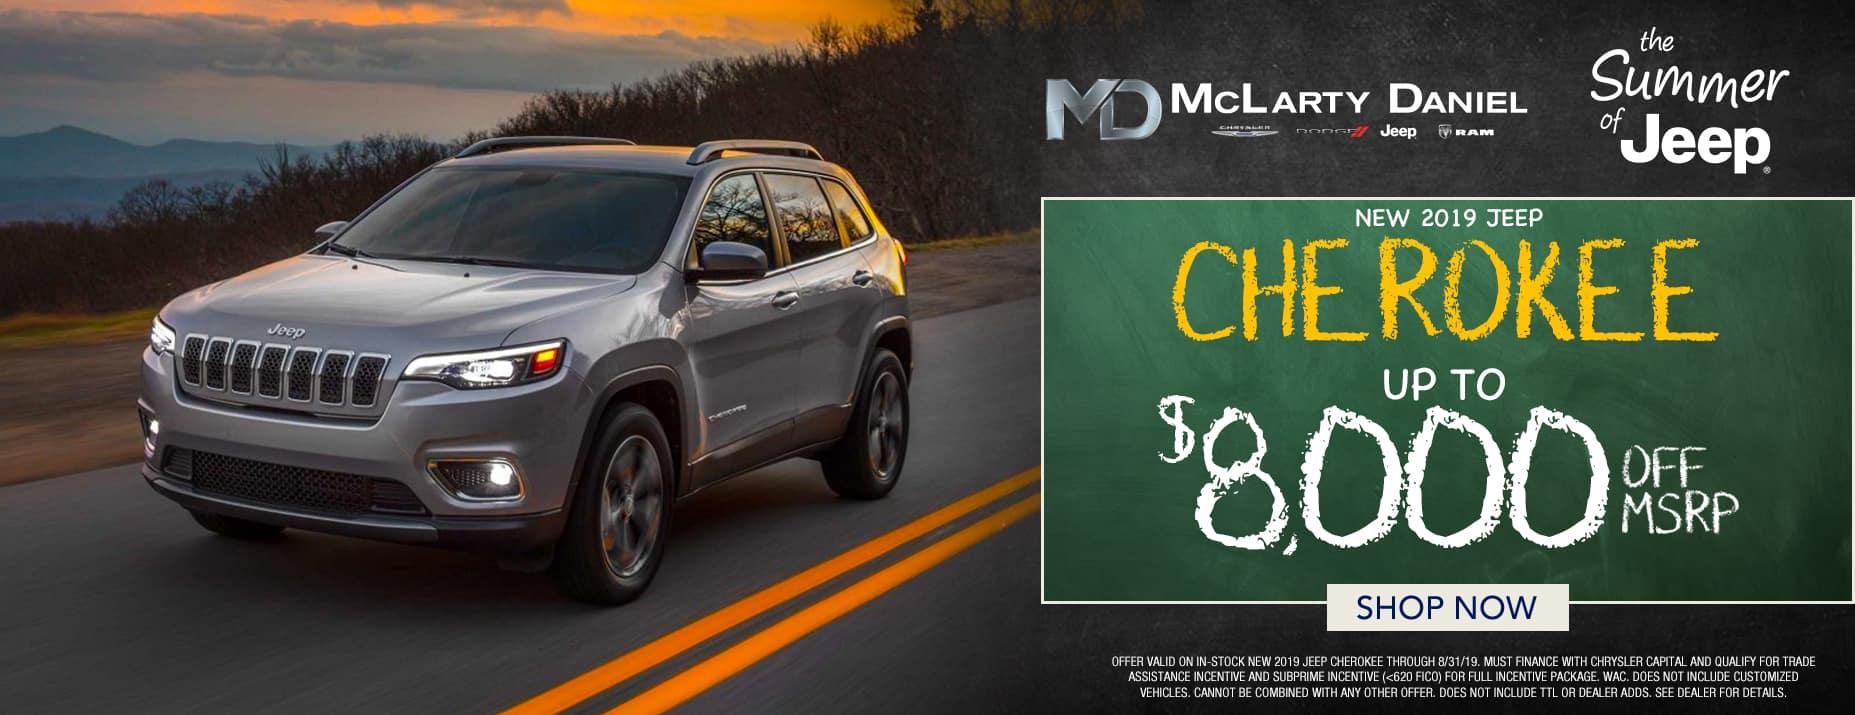 2019 Jeep Cherokee $8,000 off msrp